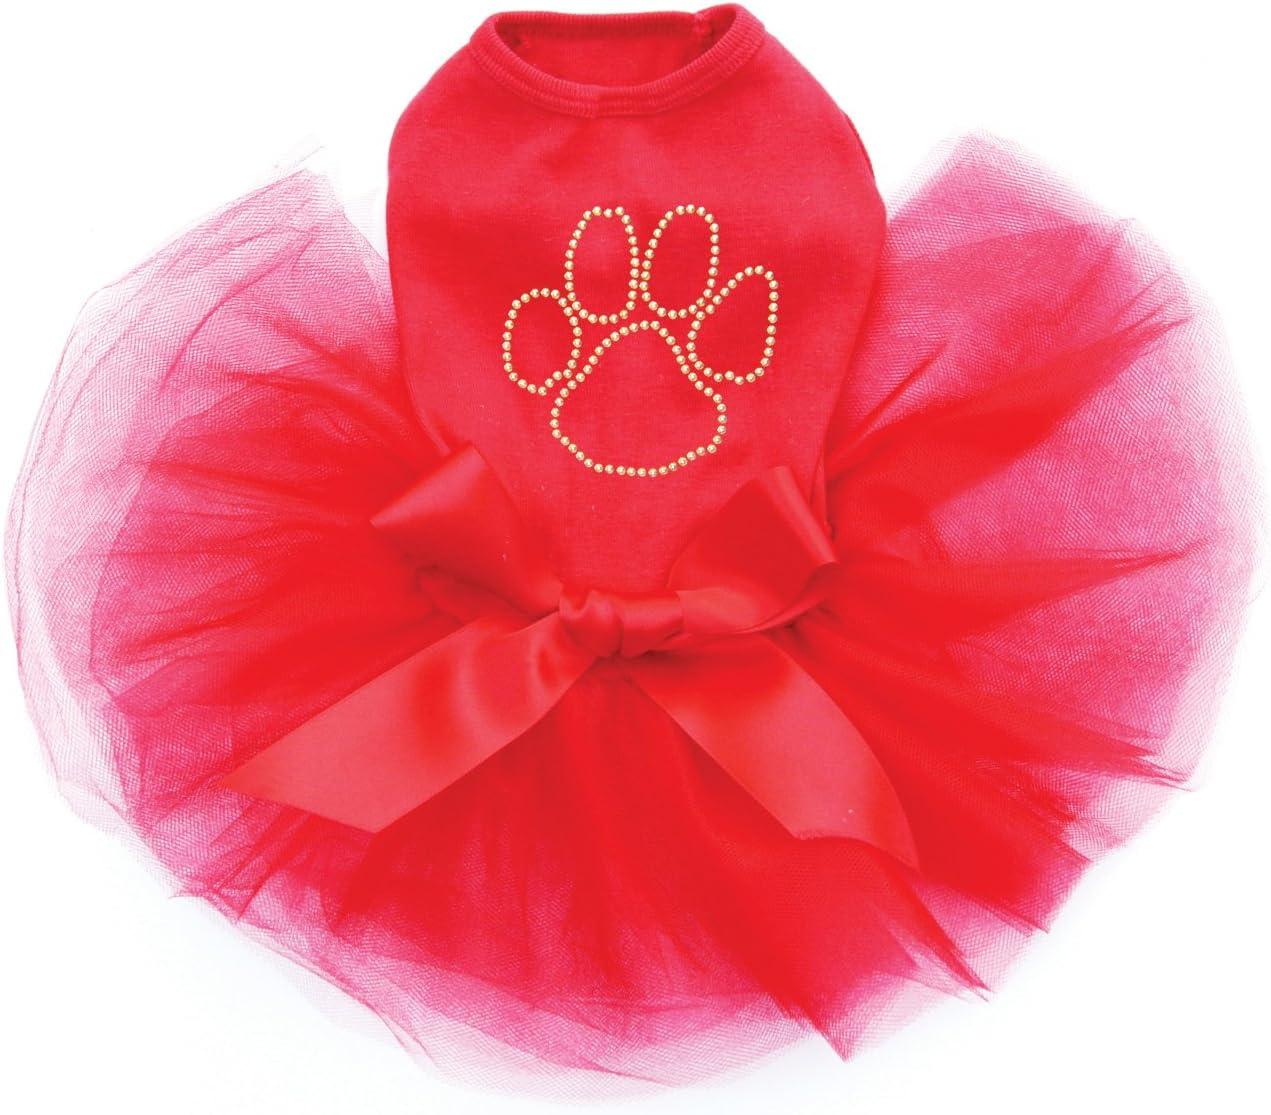 Max 55% OFF Paw- Gold Nailheads - Bling Rhinestone Dress Denver Mall Red XS Dog Tutu